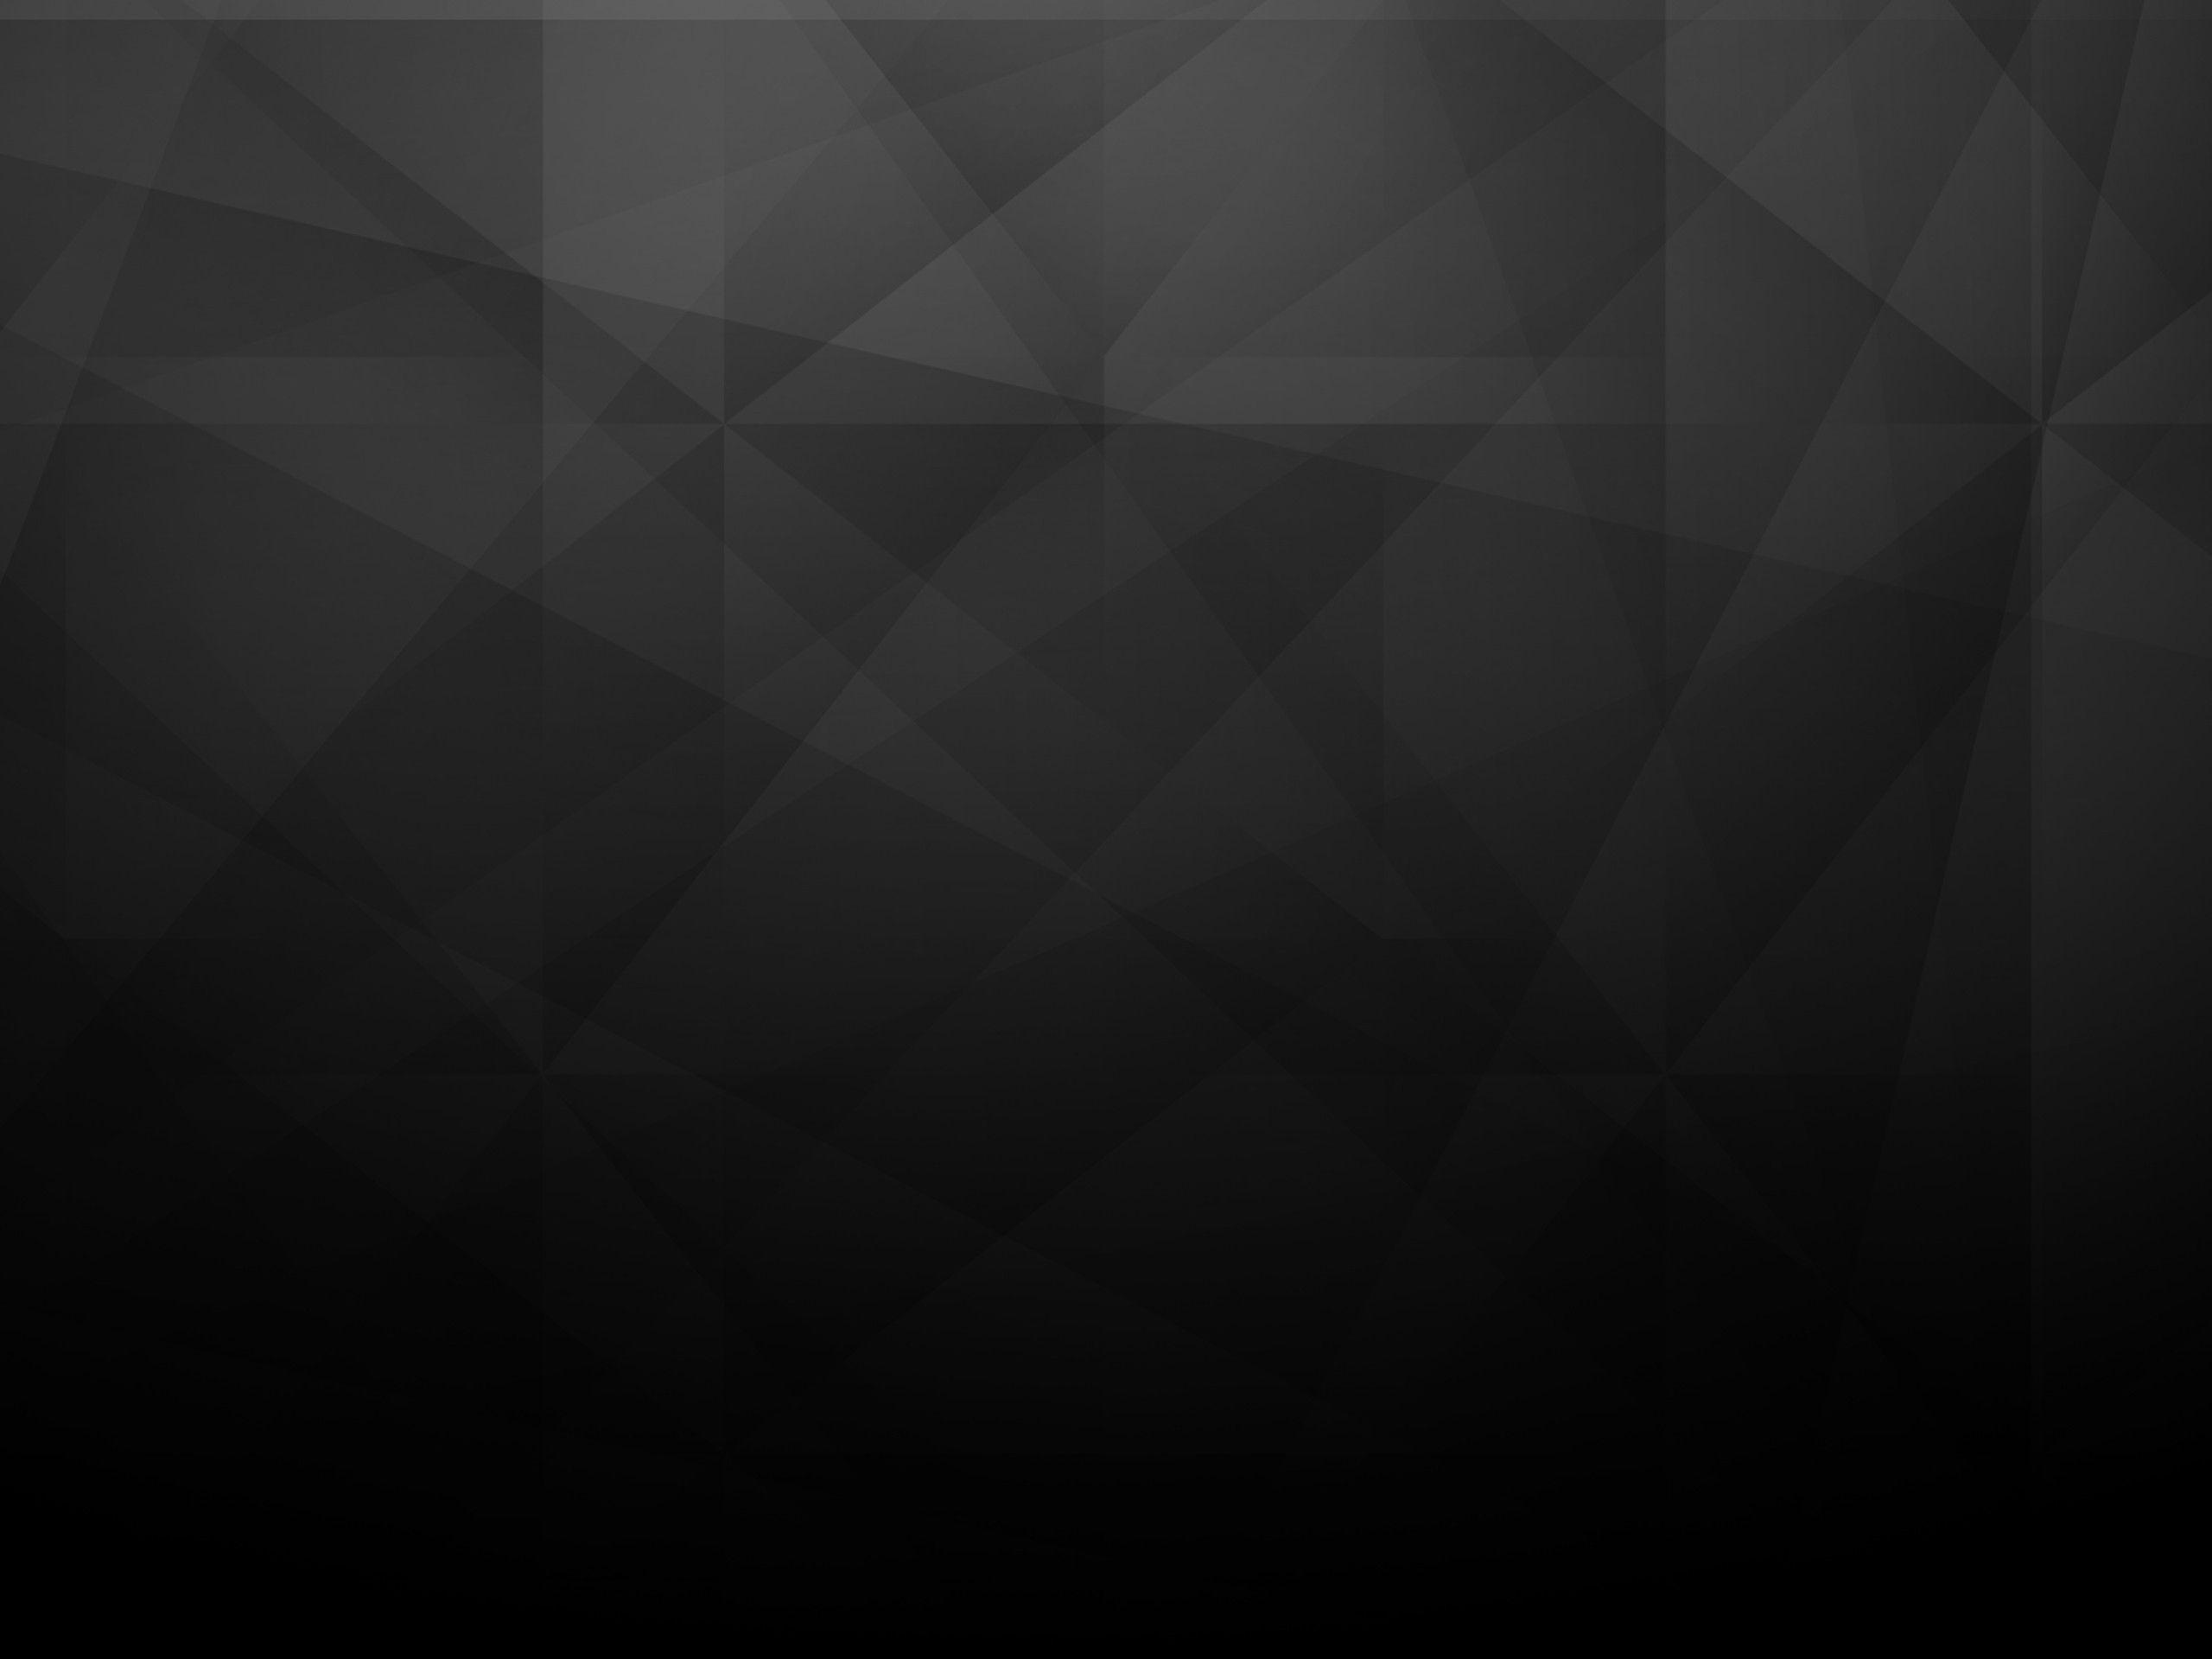 Black Elegant Wallpapers Wallpaper Black Hd Wallpaper Dark Black Wallpaper Black Wallpaper